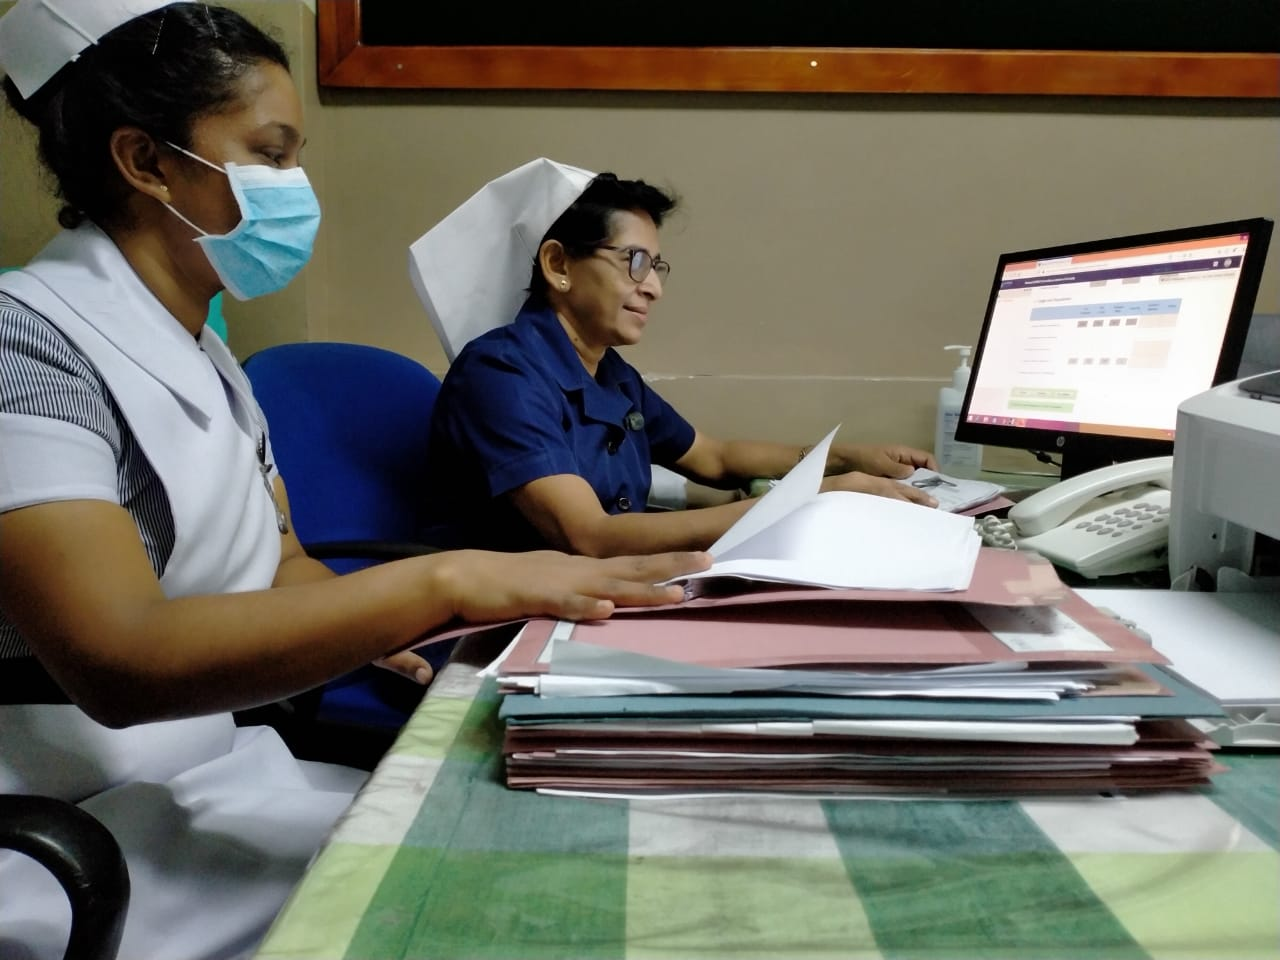 Sri Lanka DHIS2 COVID-19 surveillance data entry at health facility